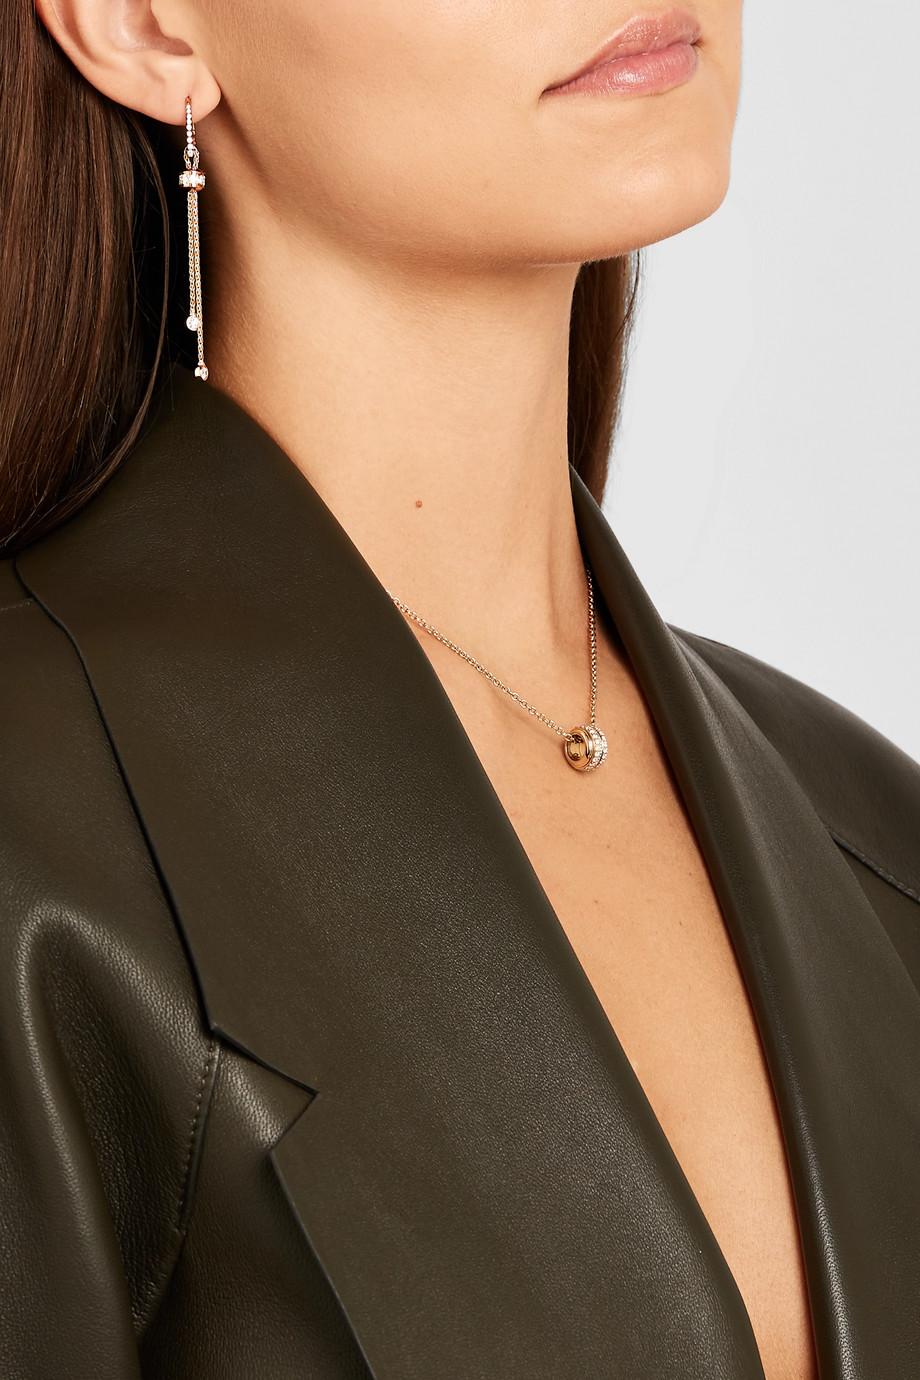 Piaget Possession Ohrringe aus 18 Karat Roségold mit Diamanten